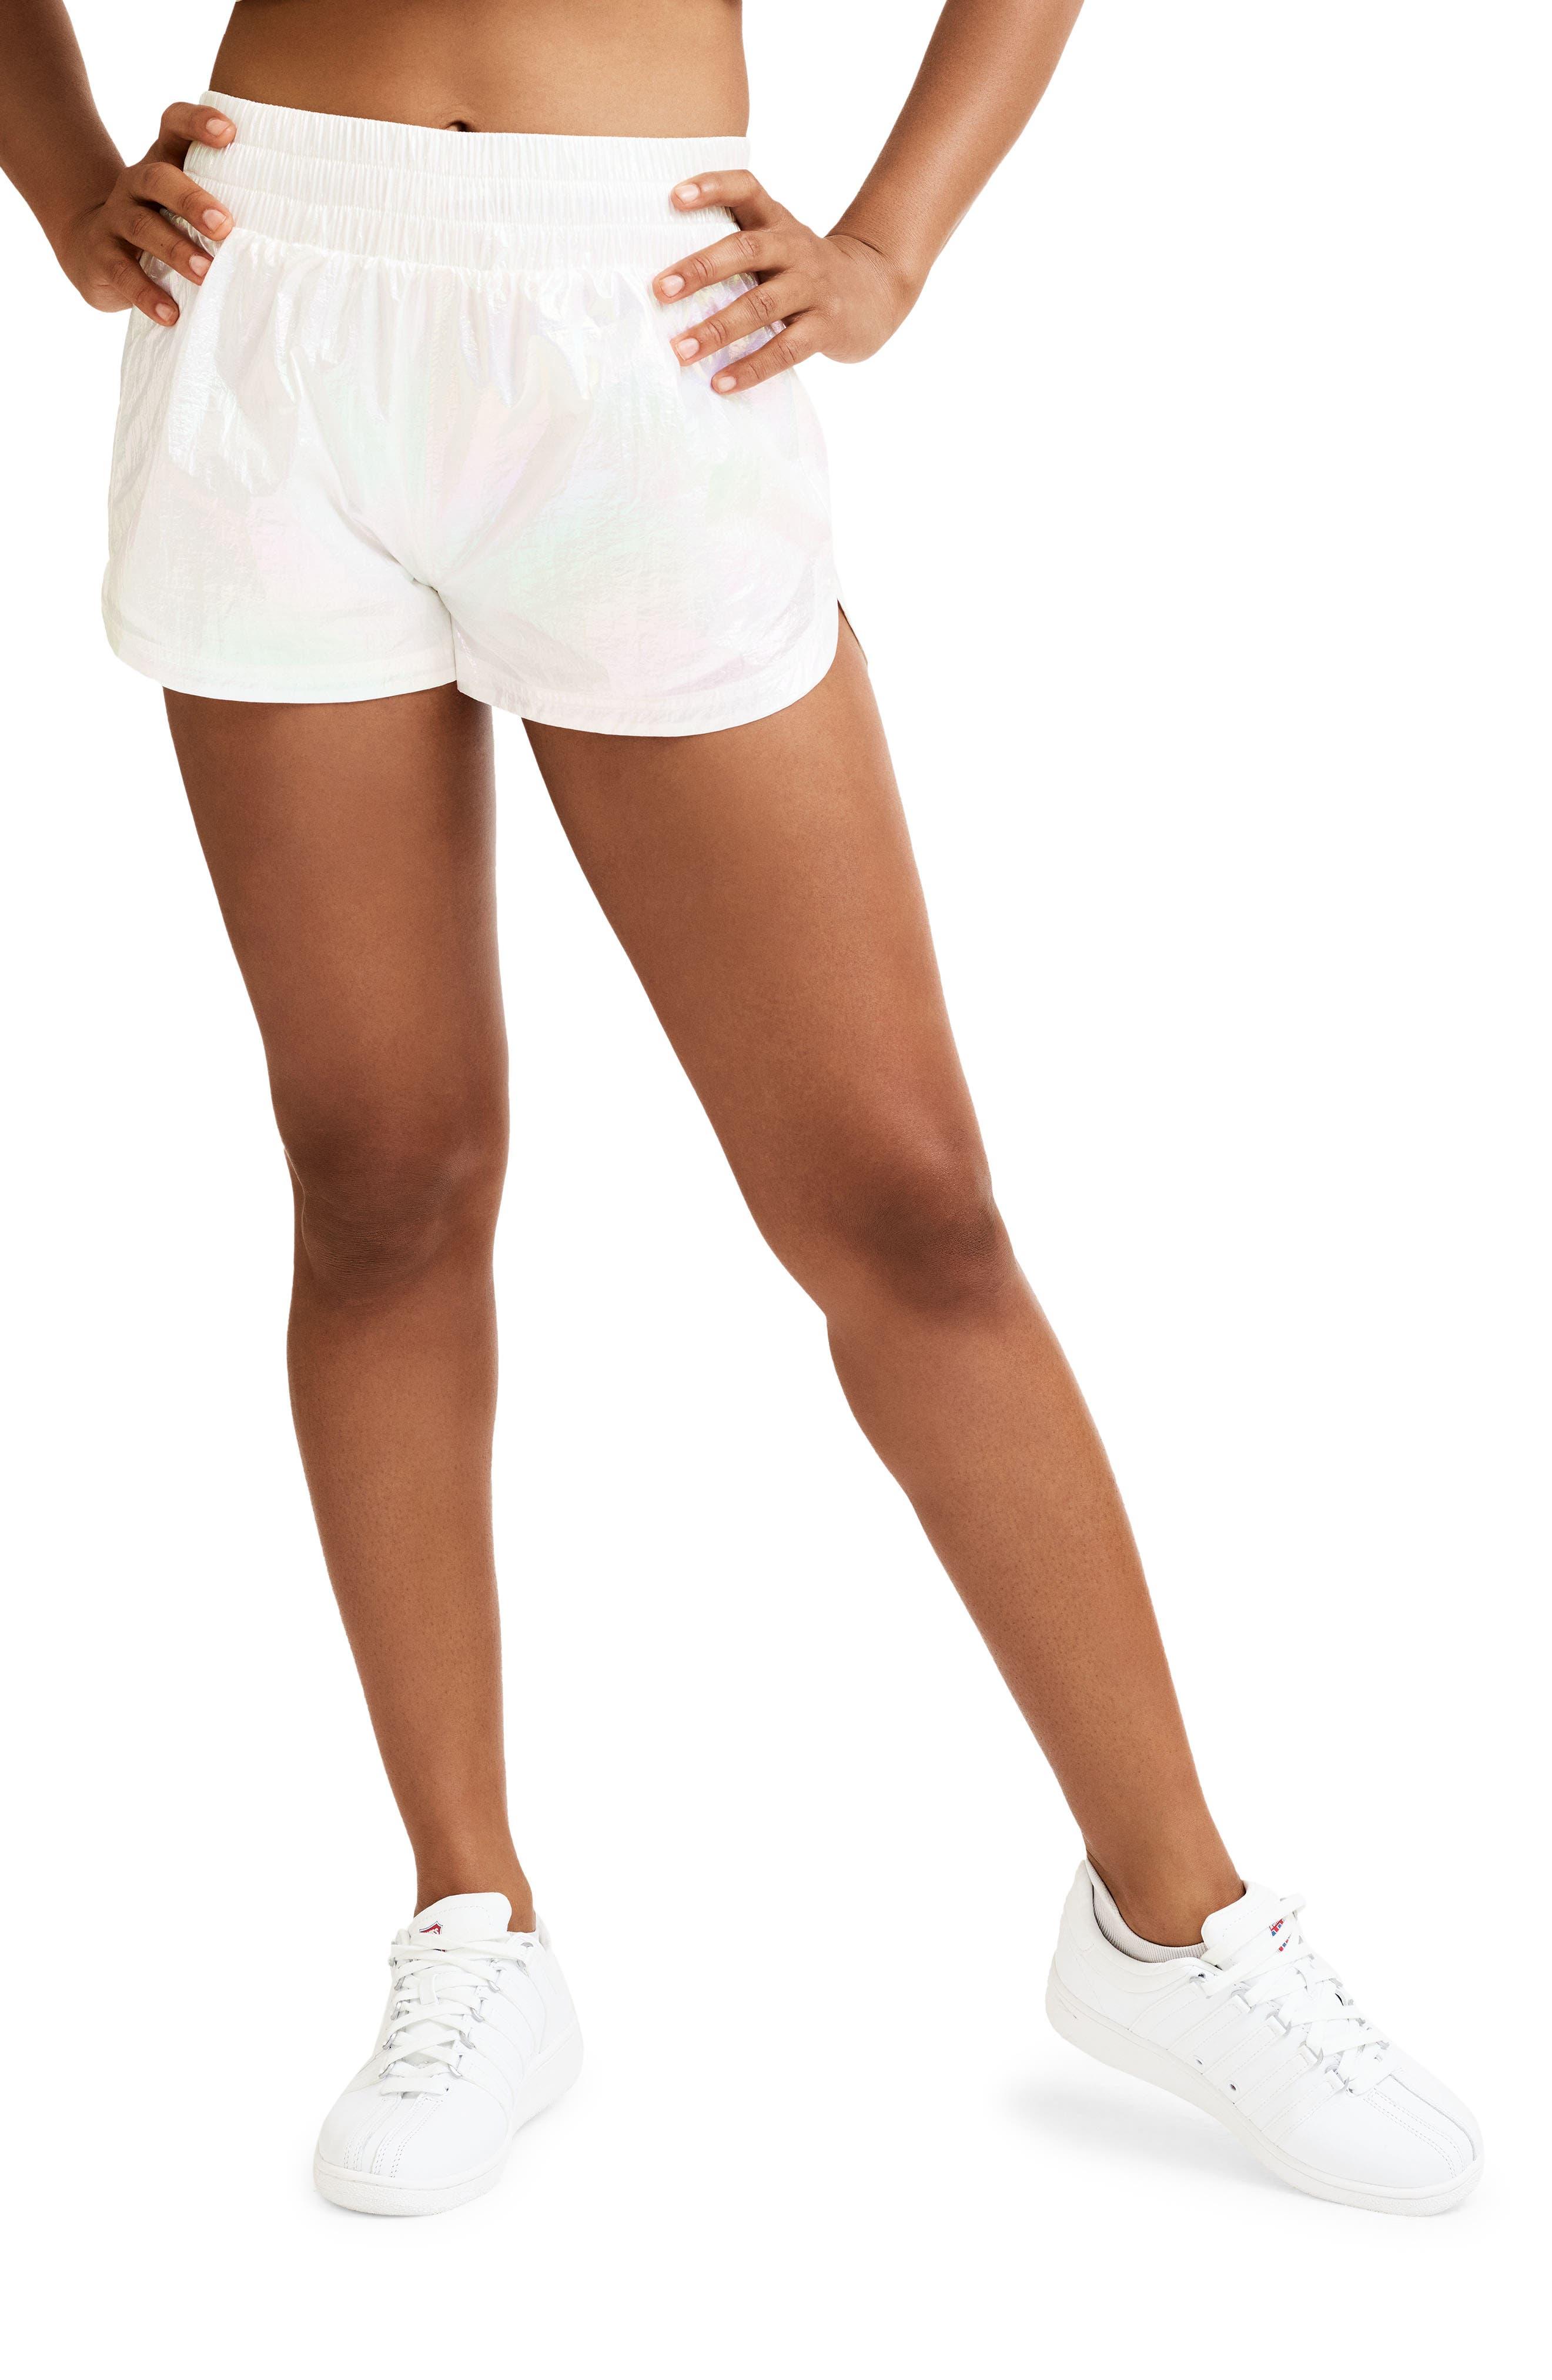 X K-Swiss Light It Up Shorts